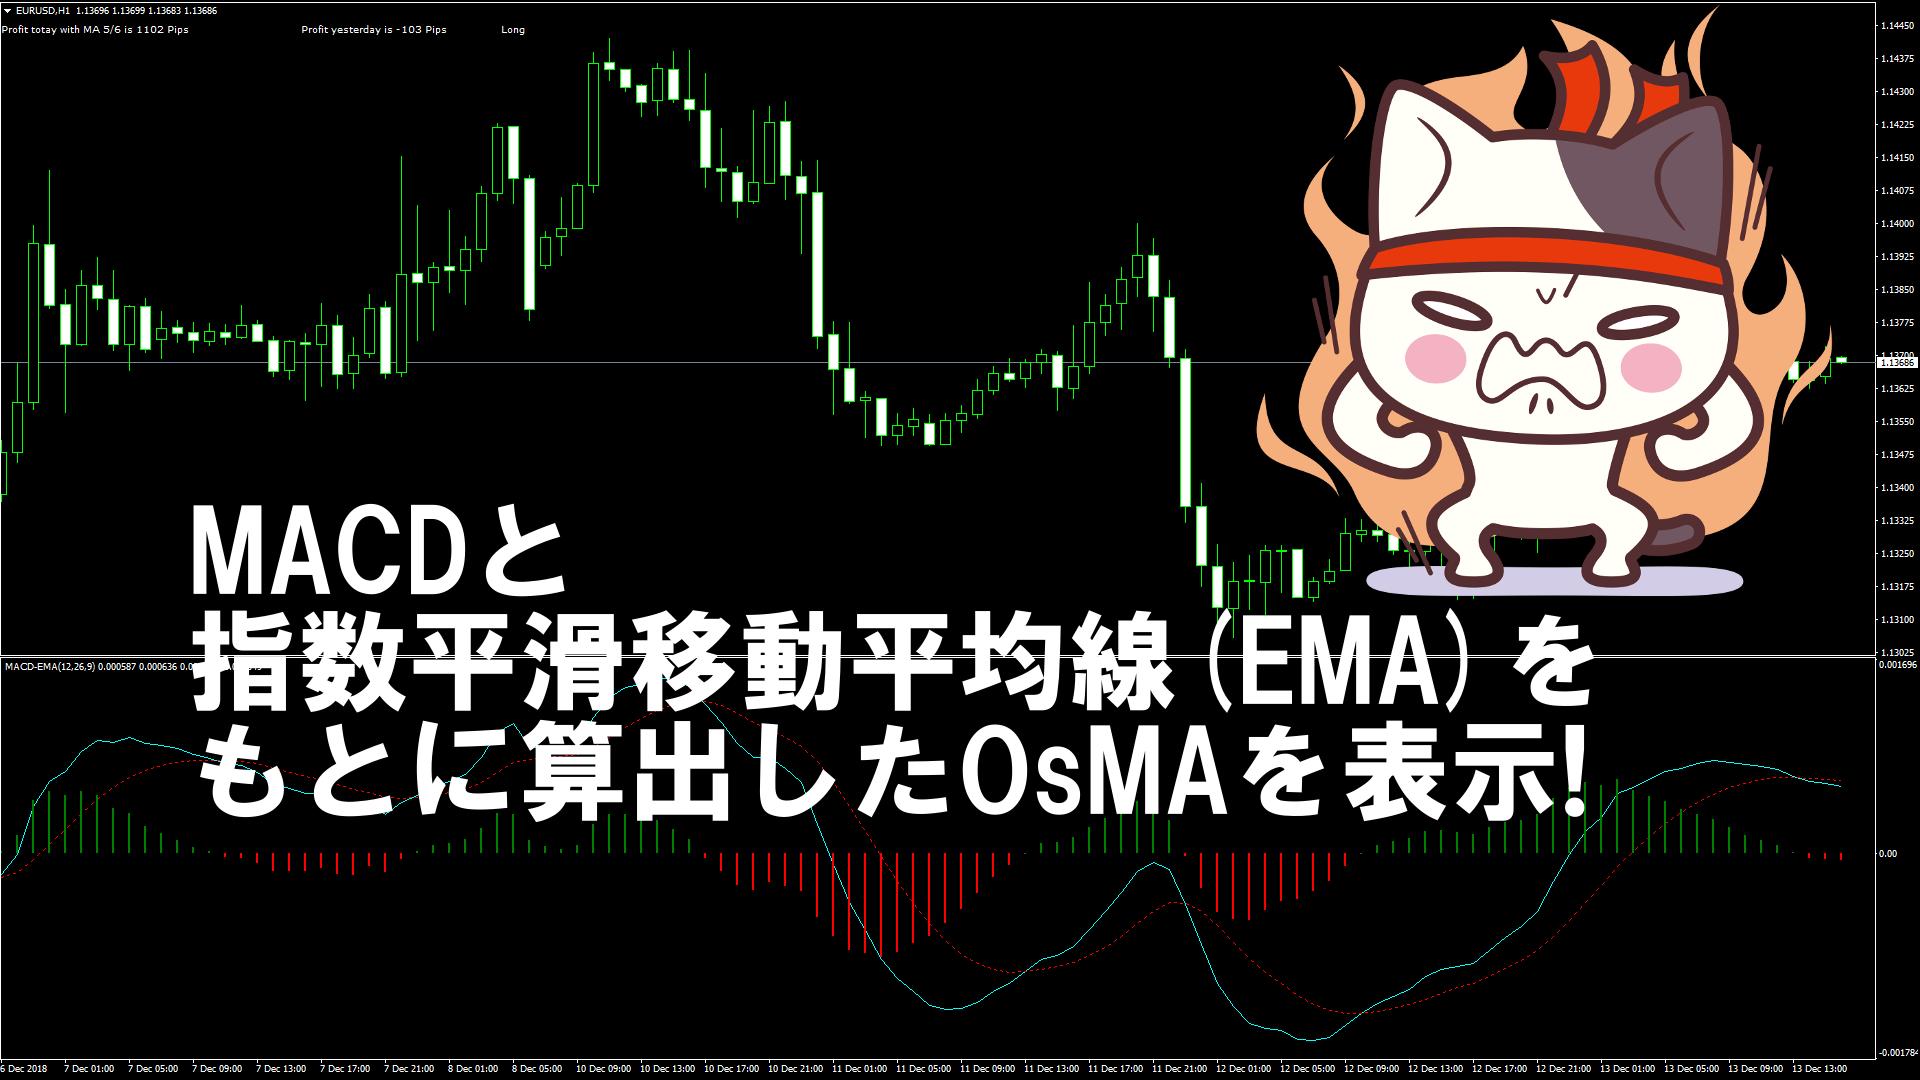 MACDと指数平滑移動平均線(EMA)をもとに算出したOsMAを表示するMT4インジケーター『MACD_EMA』